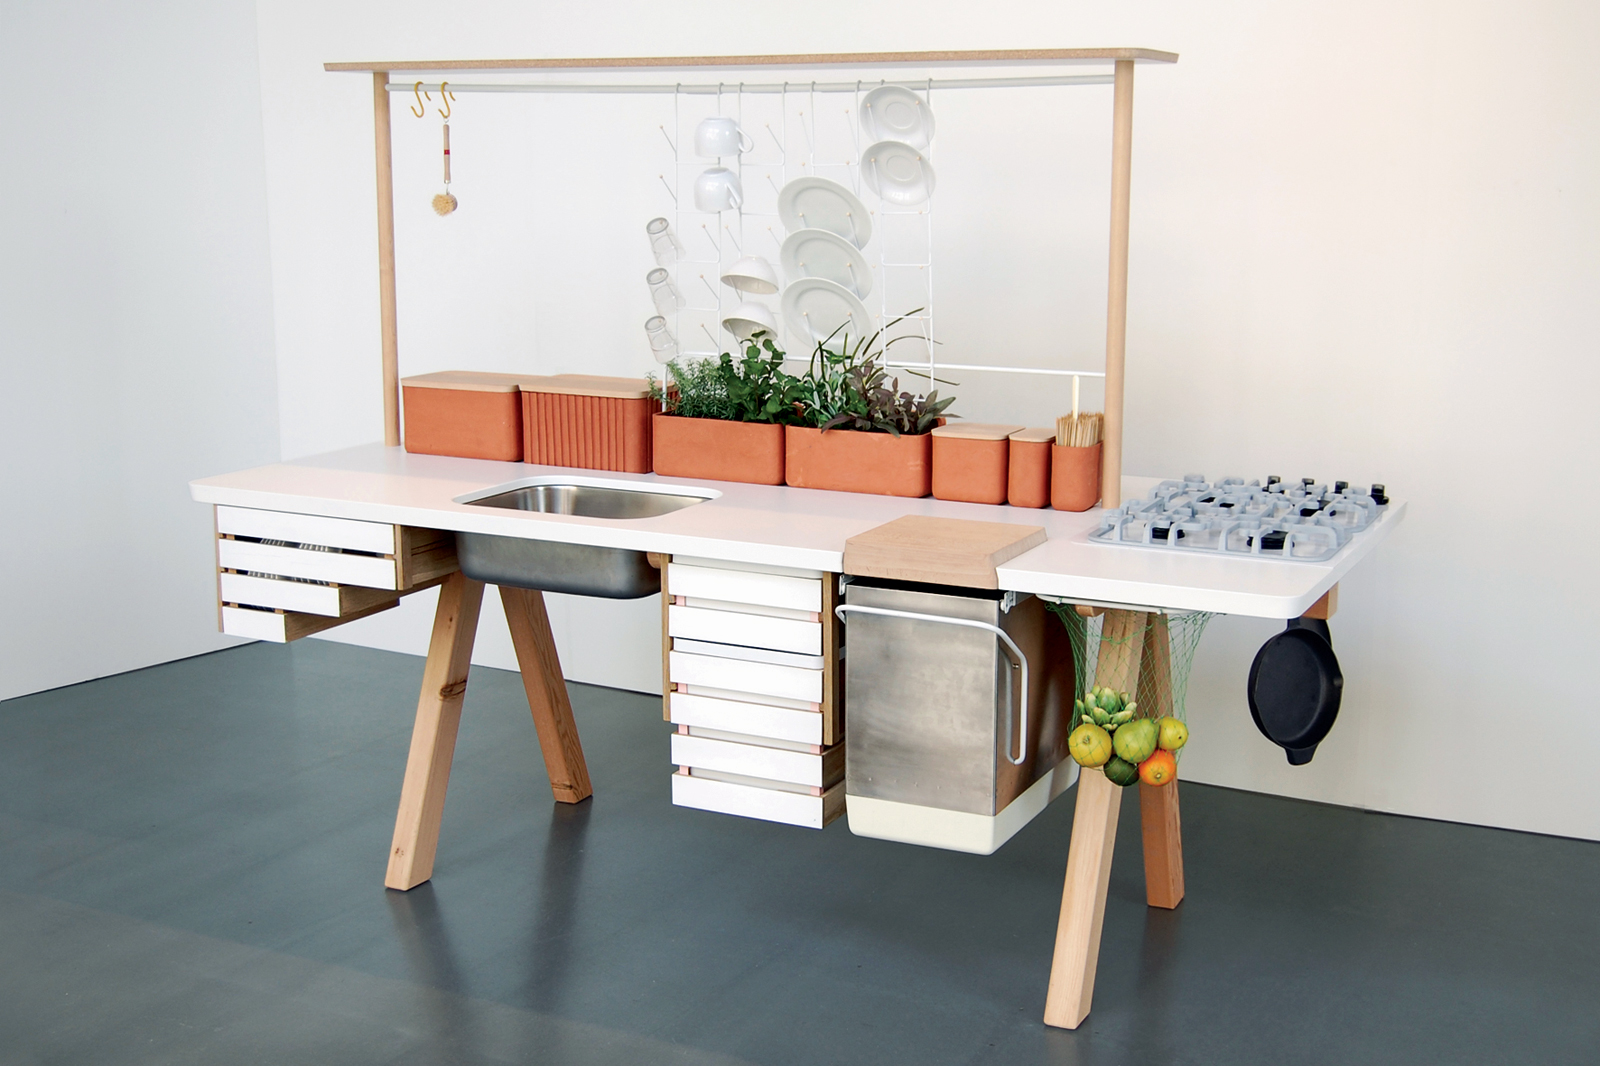 Flow 2 portable kitchen by Studio Gorm